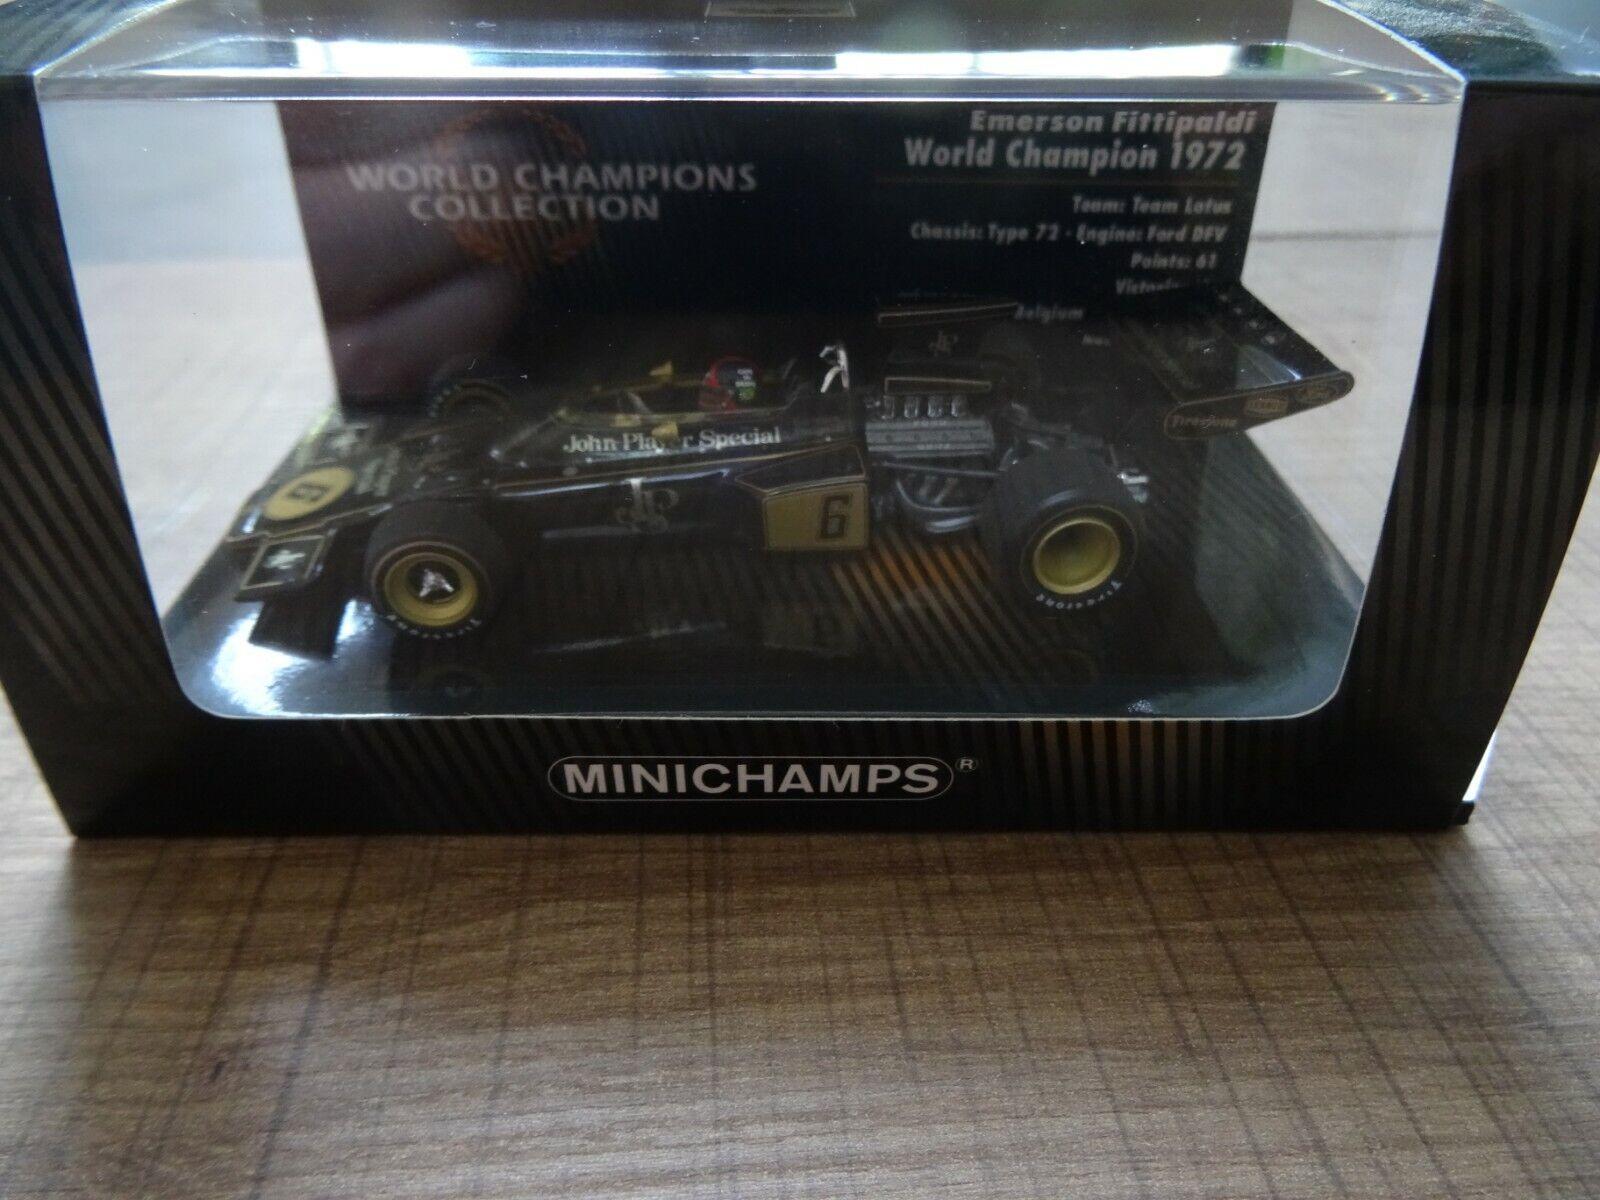 MINICHAMPS LOTUS 72   E. FITTIPALDI WORLD CHAMPION 1972 1 43  WITH SPONSOR DECALS  expédition rapide